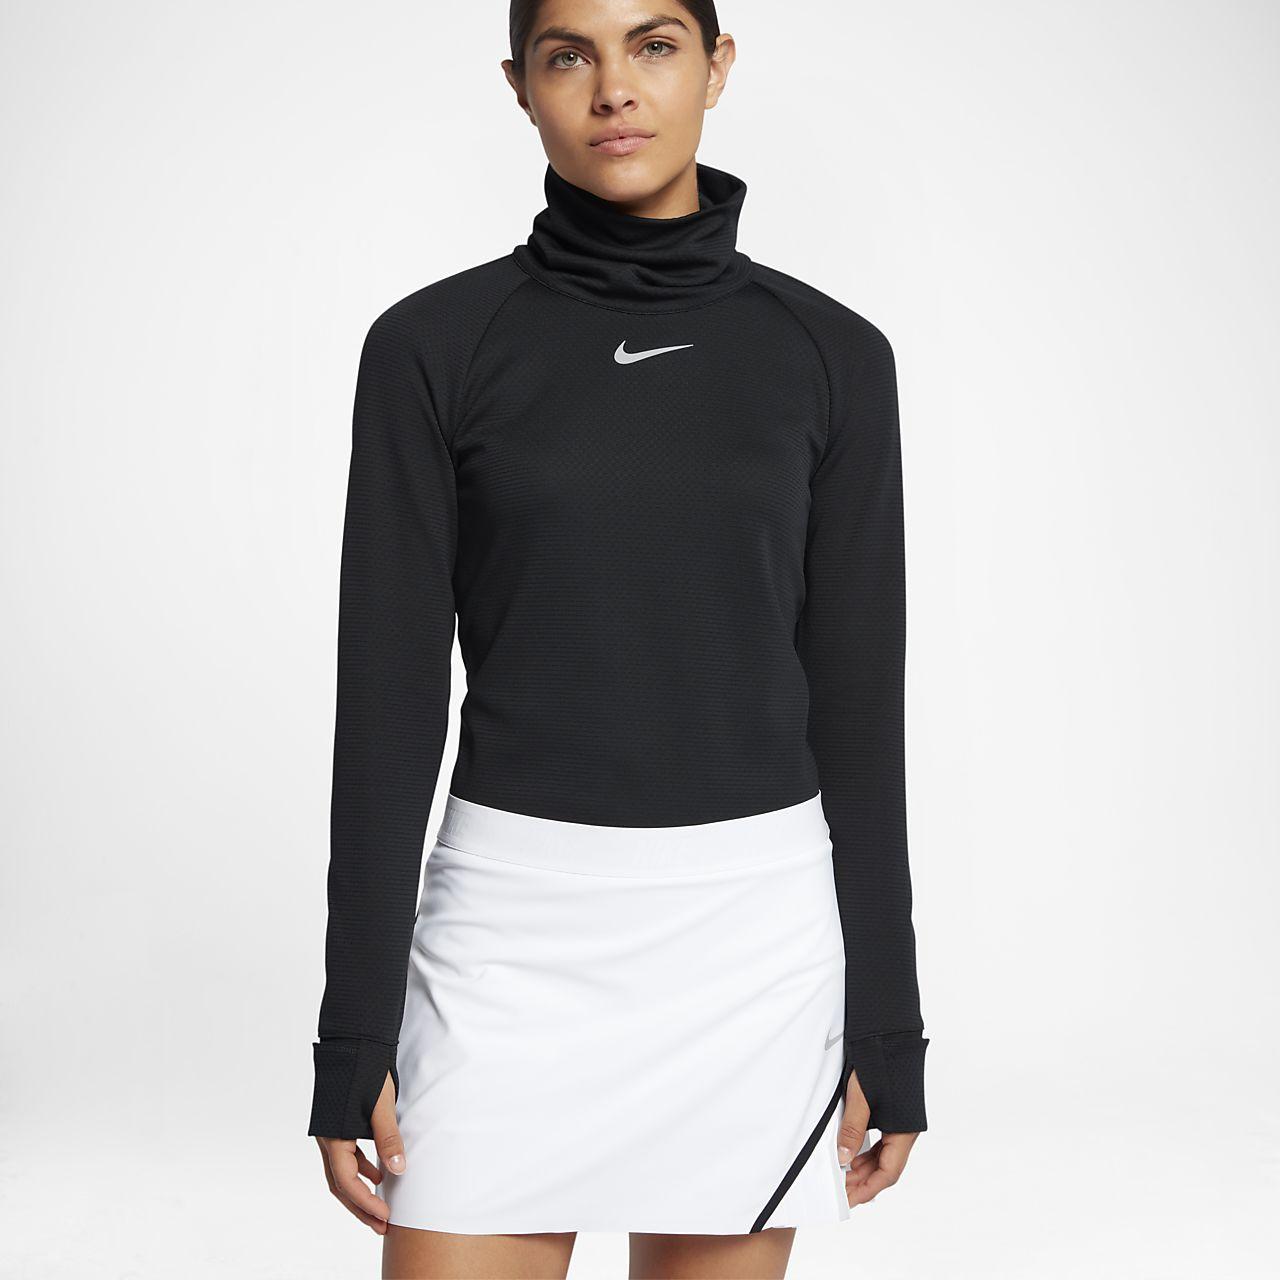 Nike AeroReact Warm Women's Long-Sleeve Golf Top